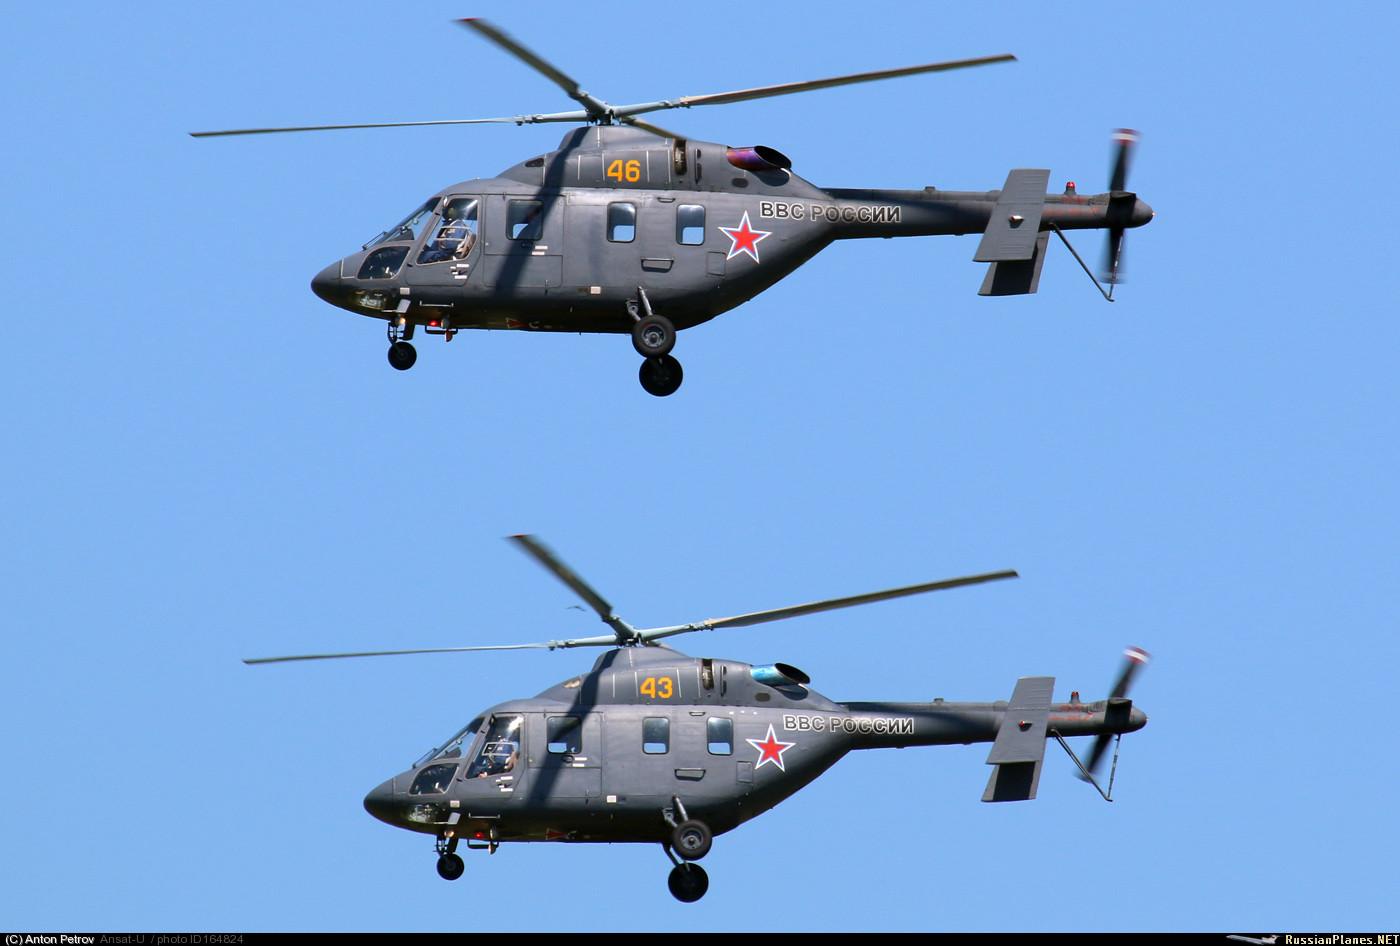 Ka-226 and Ansat-U - Page 3 2364416_original